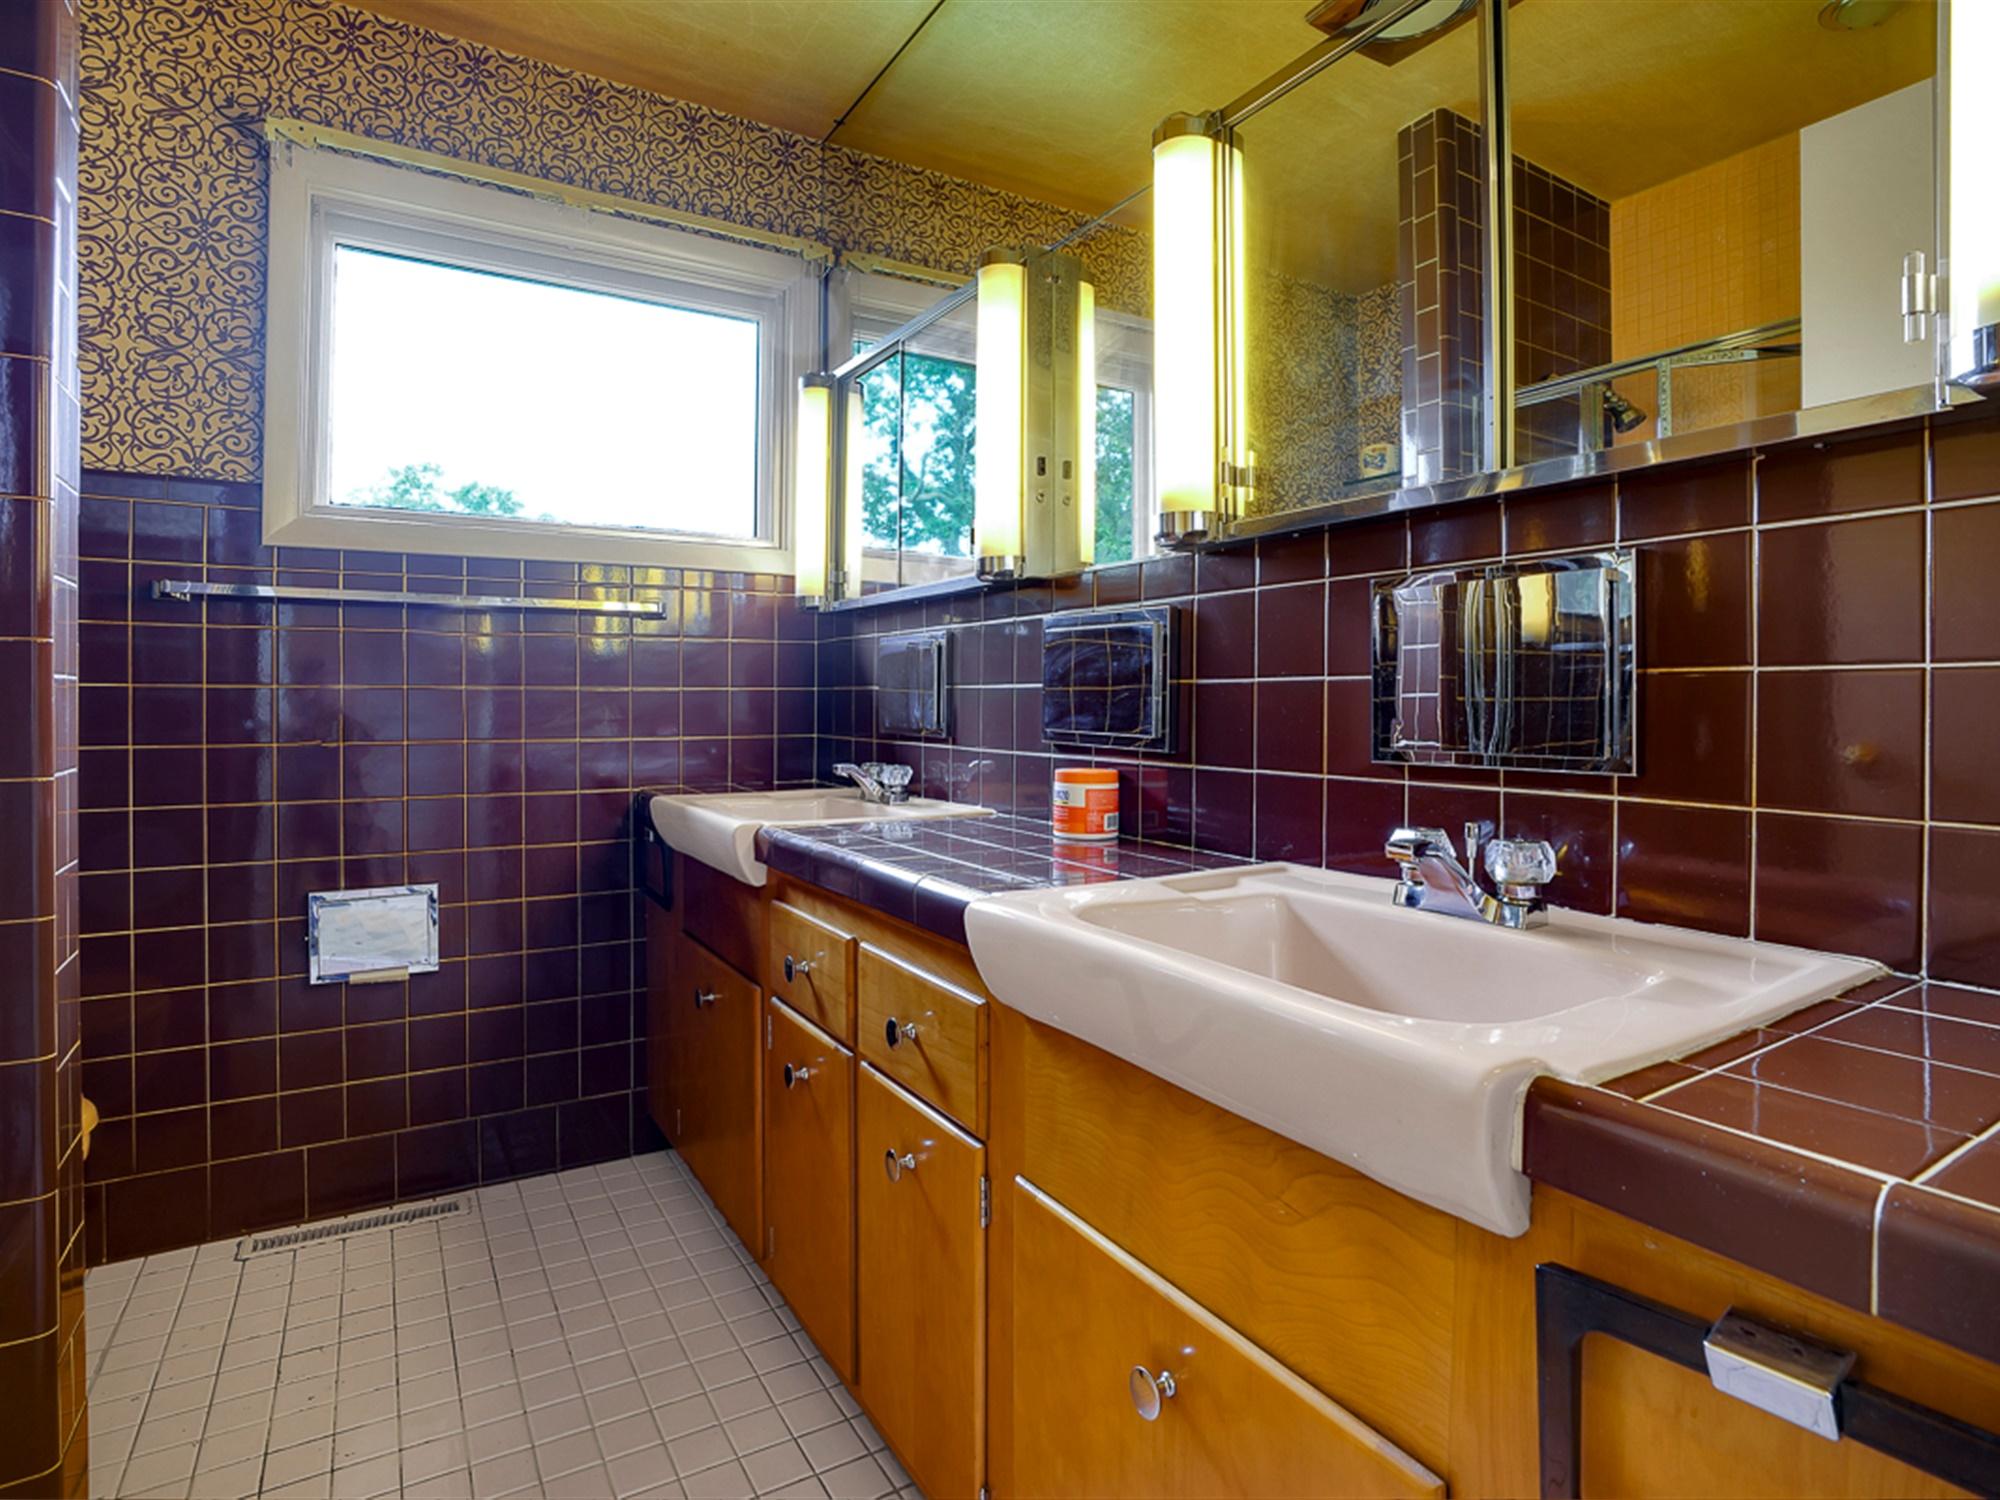 964 Reber St - Bathroom 3